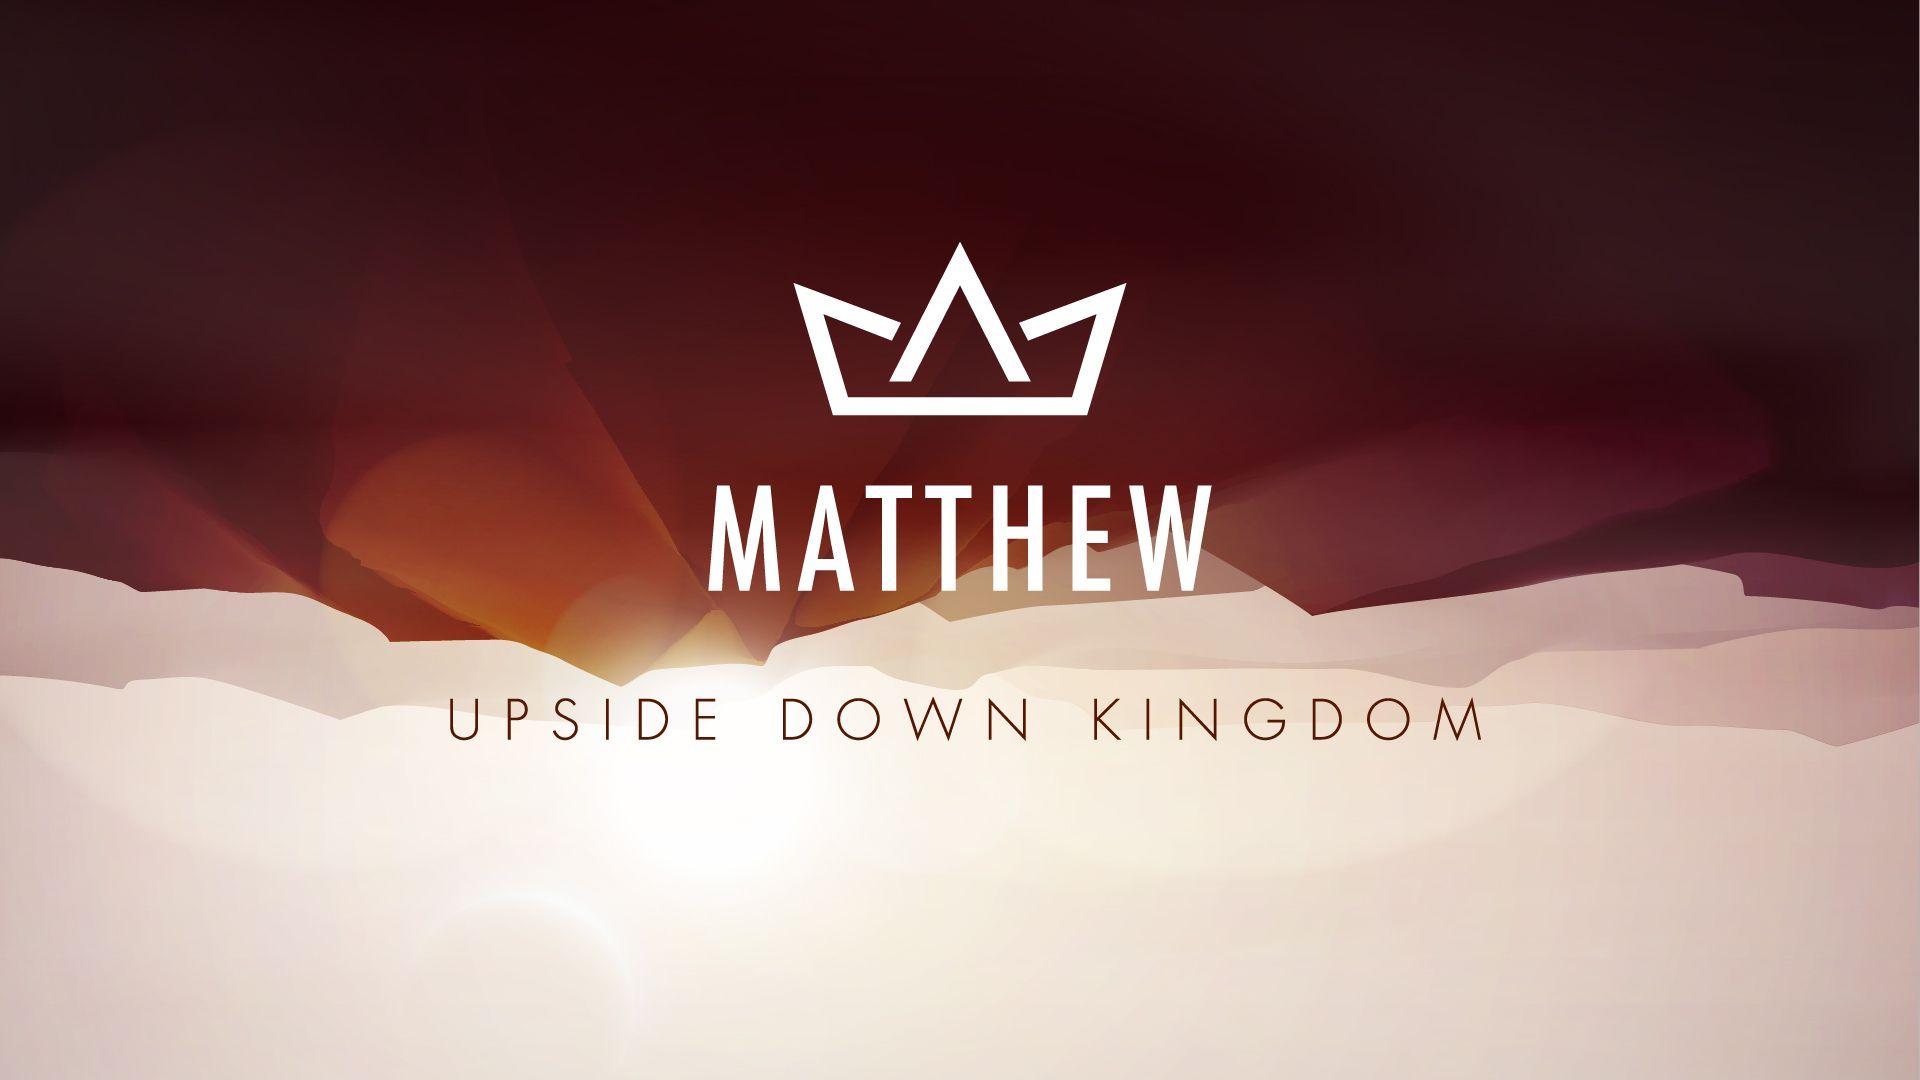 'Matthew' by Anthem Church Sermon series, Church, Sermon